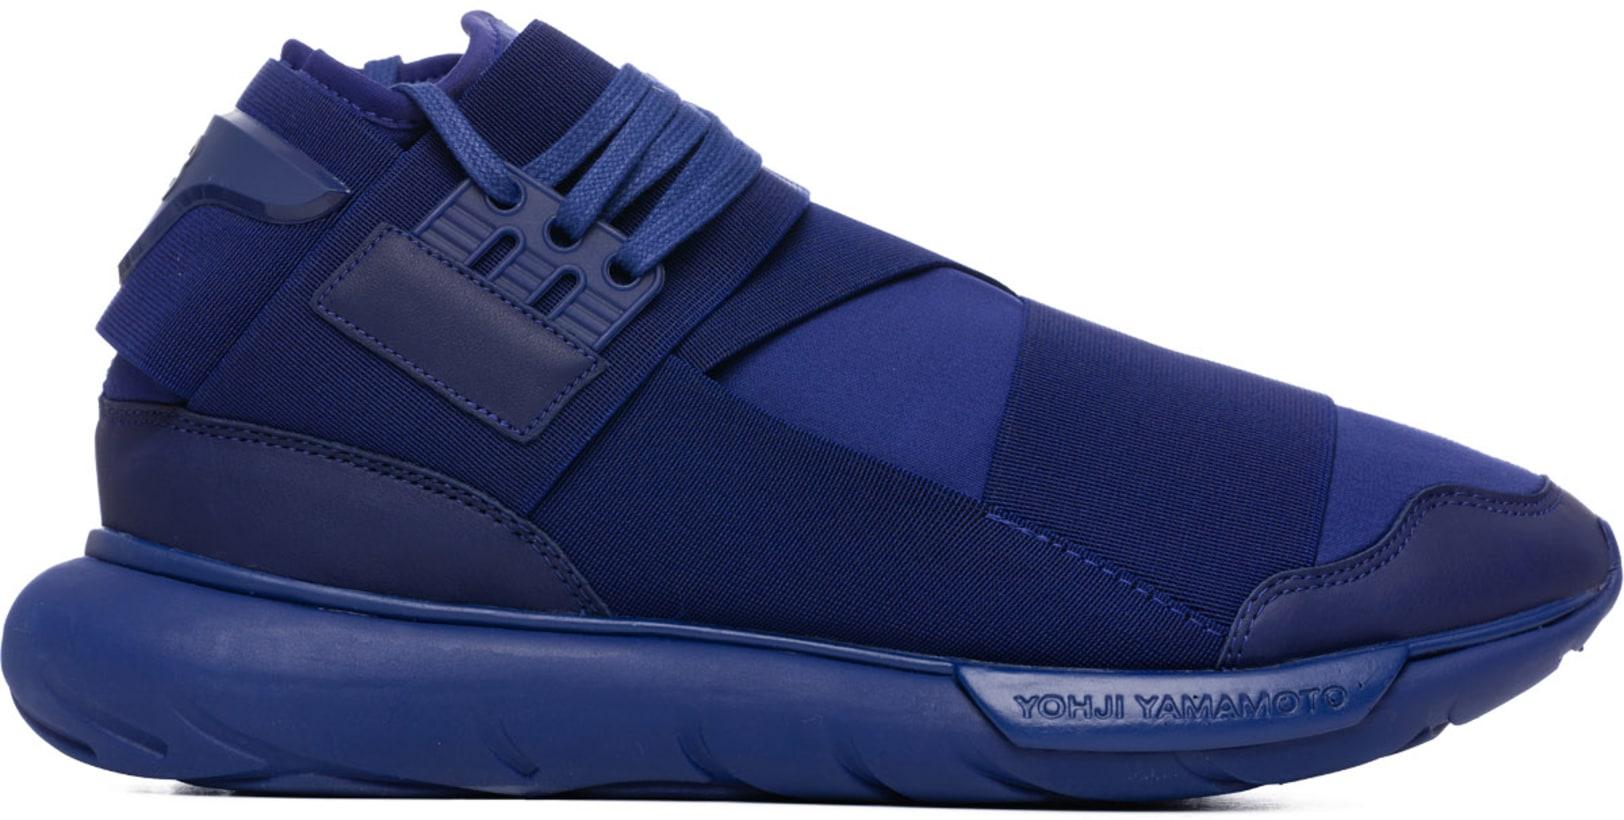 6d8322f7bc8fd Y-3  Qasa High Sneakers - Amazon Purple